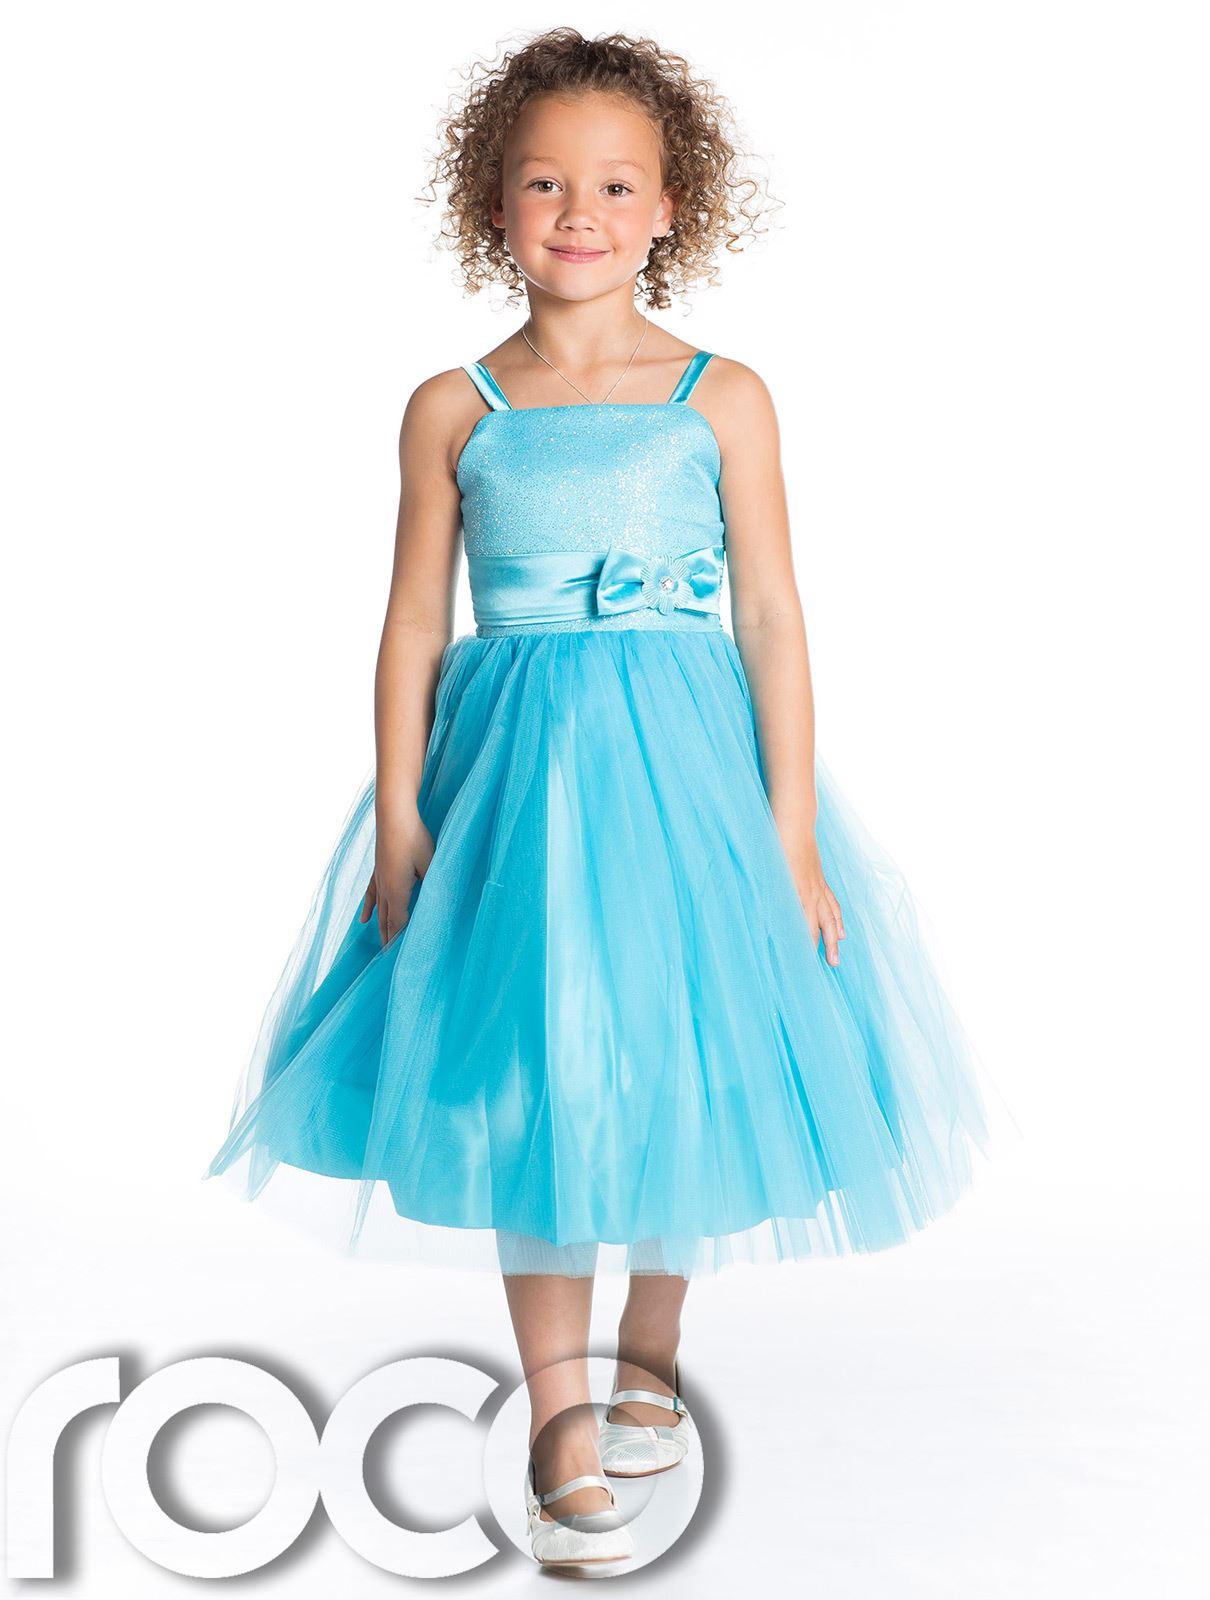 Girls Bridesmaid Dresses, Bow Detail Dress, Girls Party Dress, Prom ...